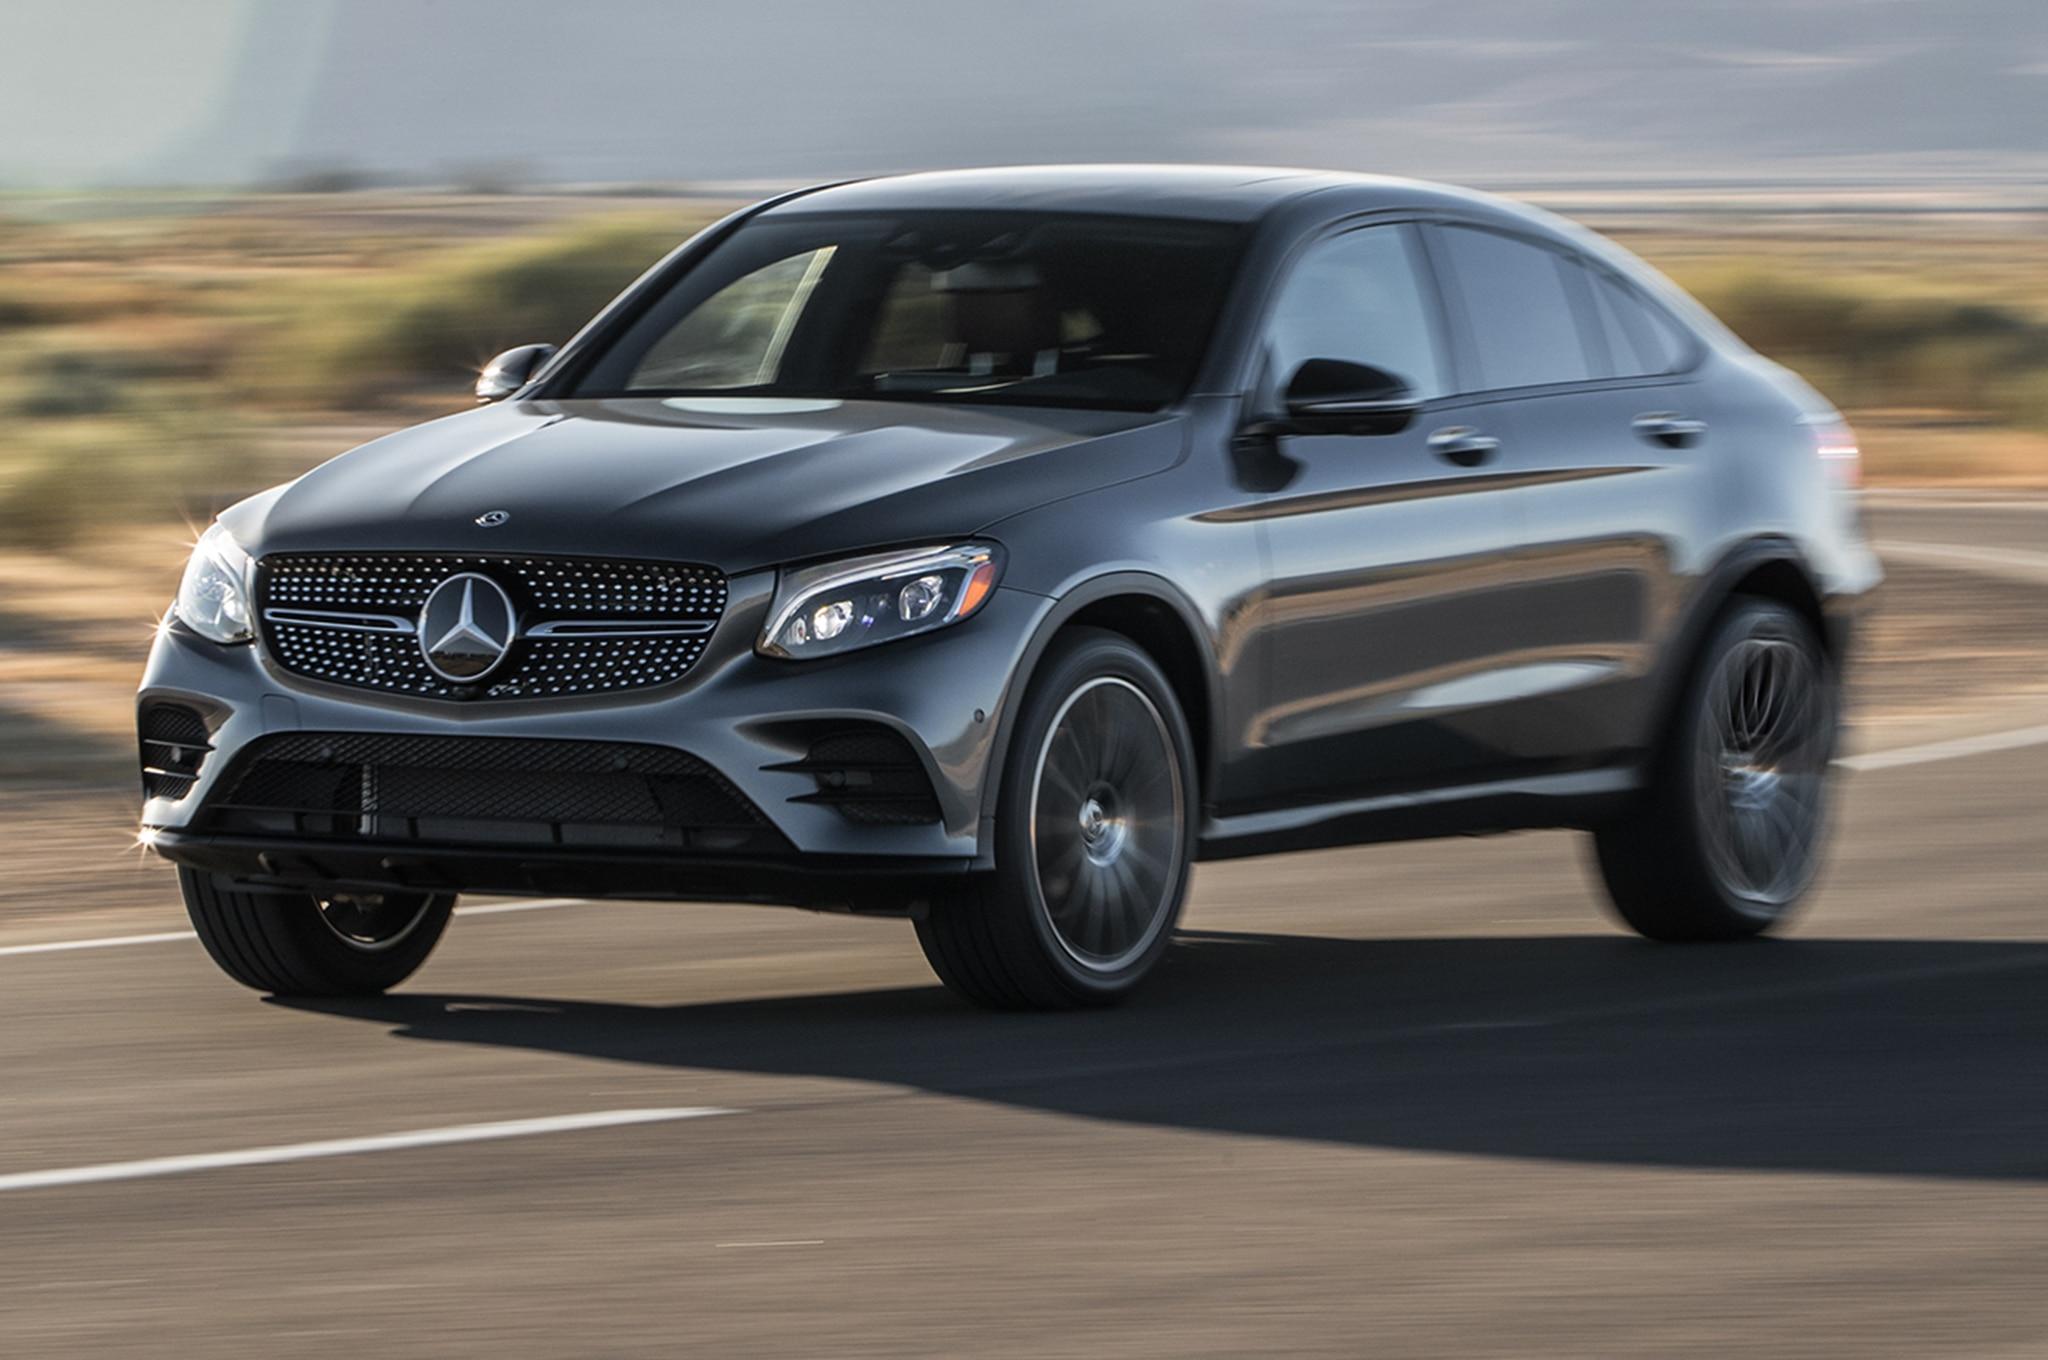 2018 Mercedes Benz GLC300 Front Three Quarter In Motion 00